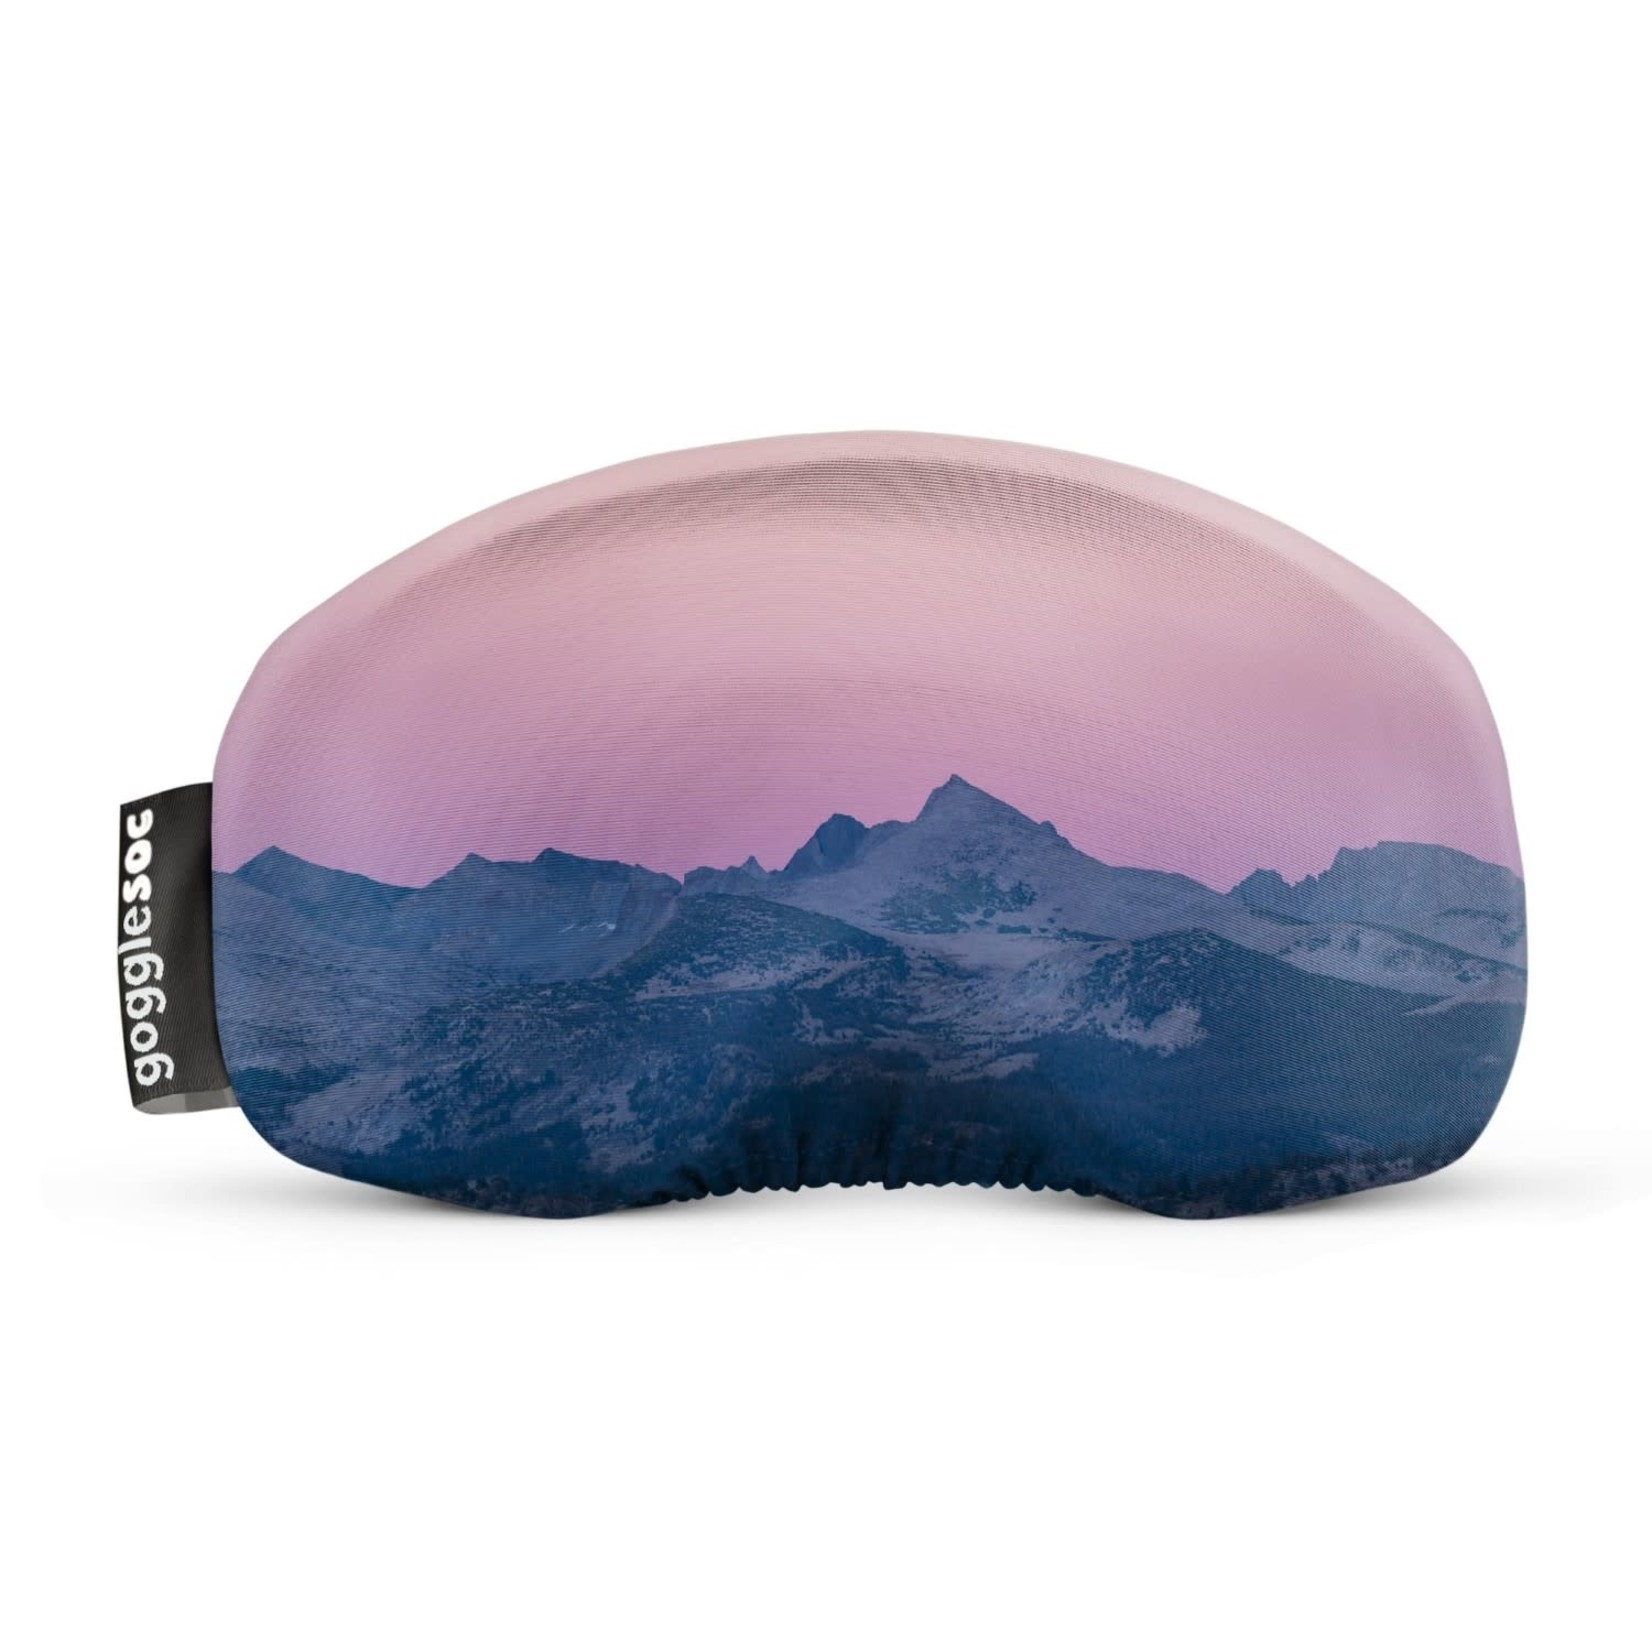 GoggleSoc Housse Goggle Soc pour lunettes de ski